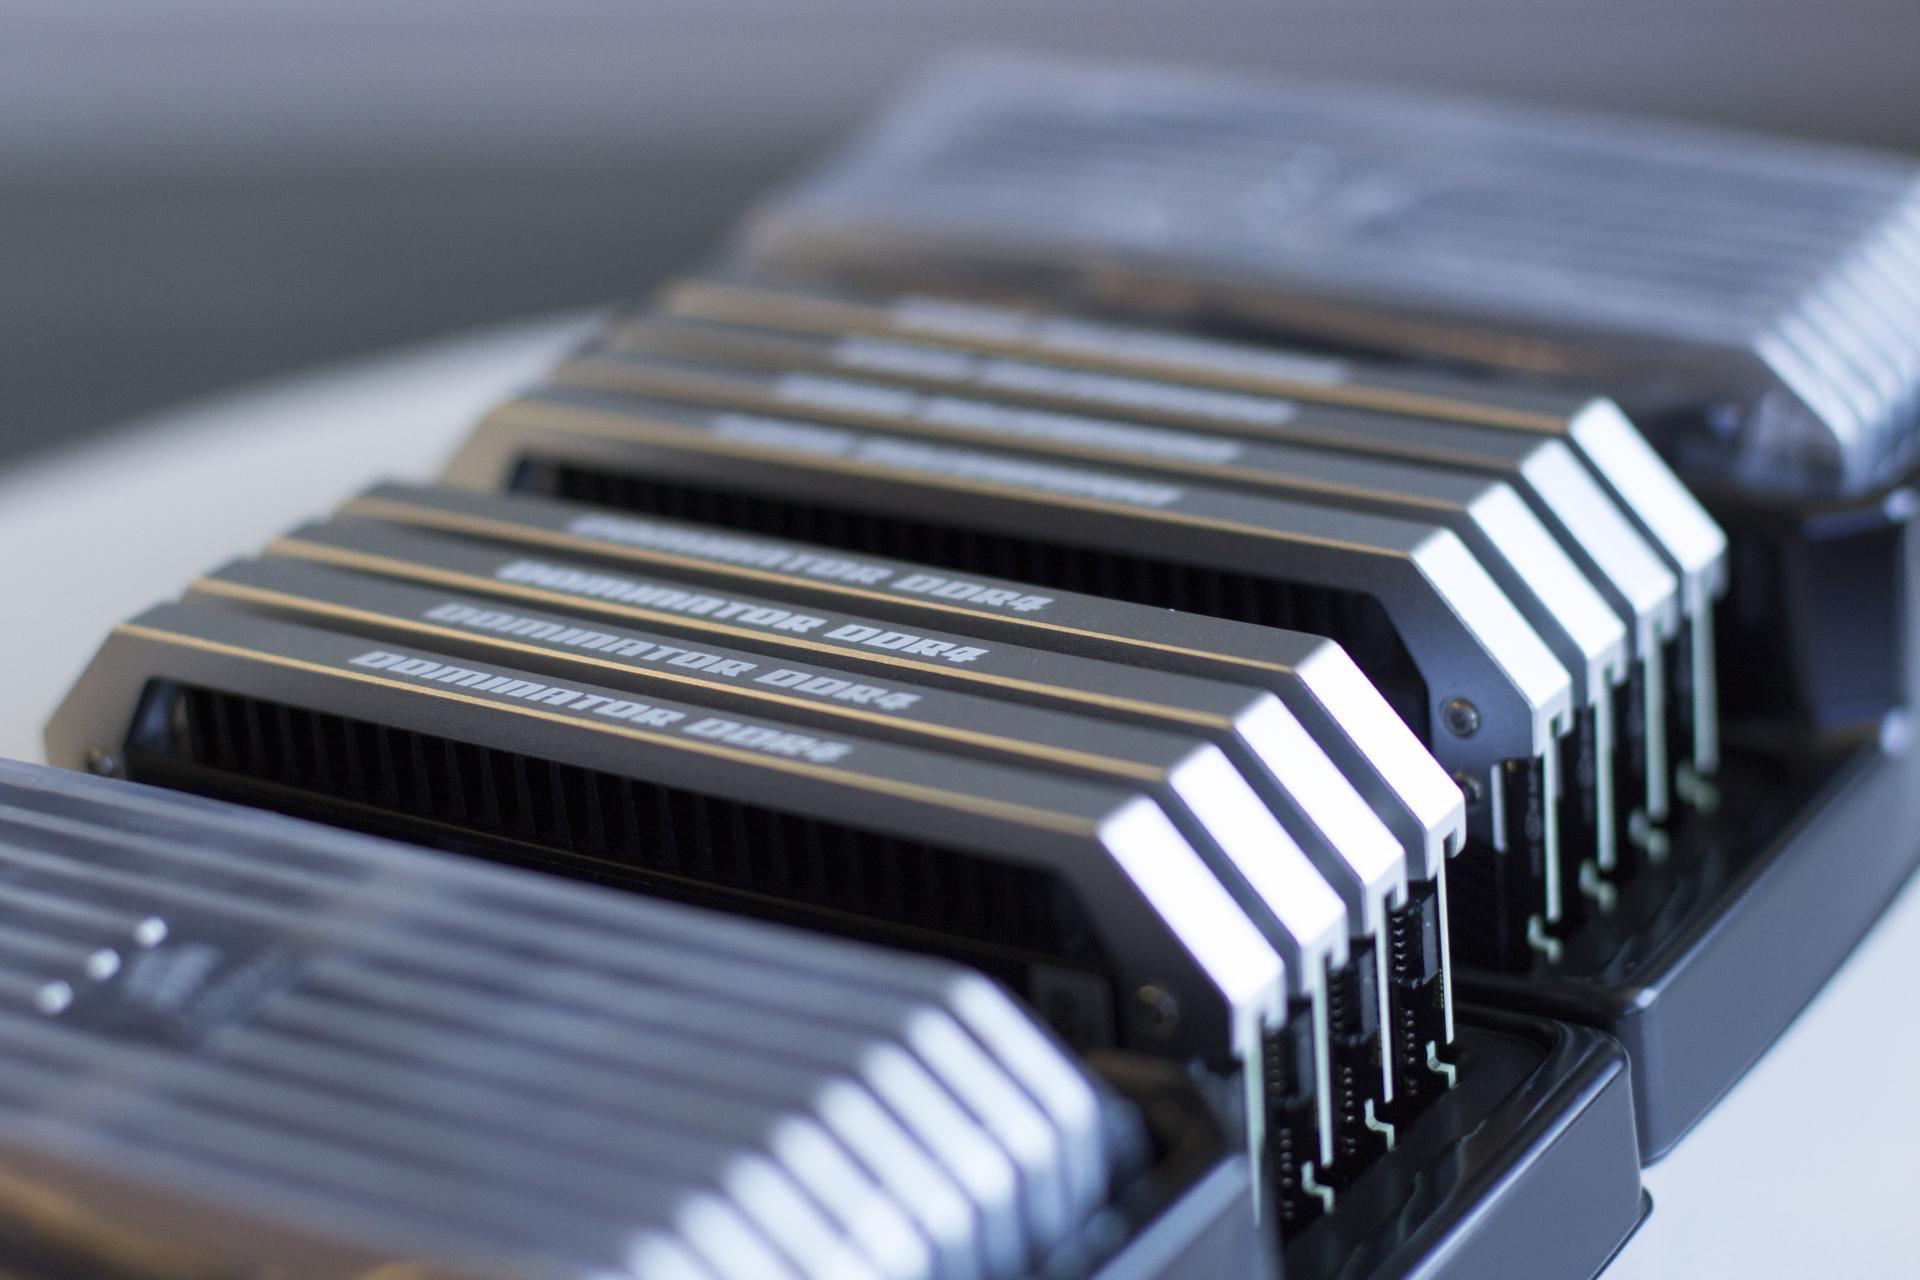 Si te parece mucho 32GB. Ya vienen Kits DDR4 de 128GB...